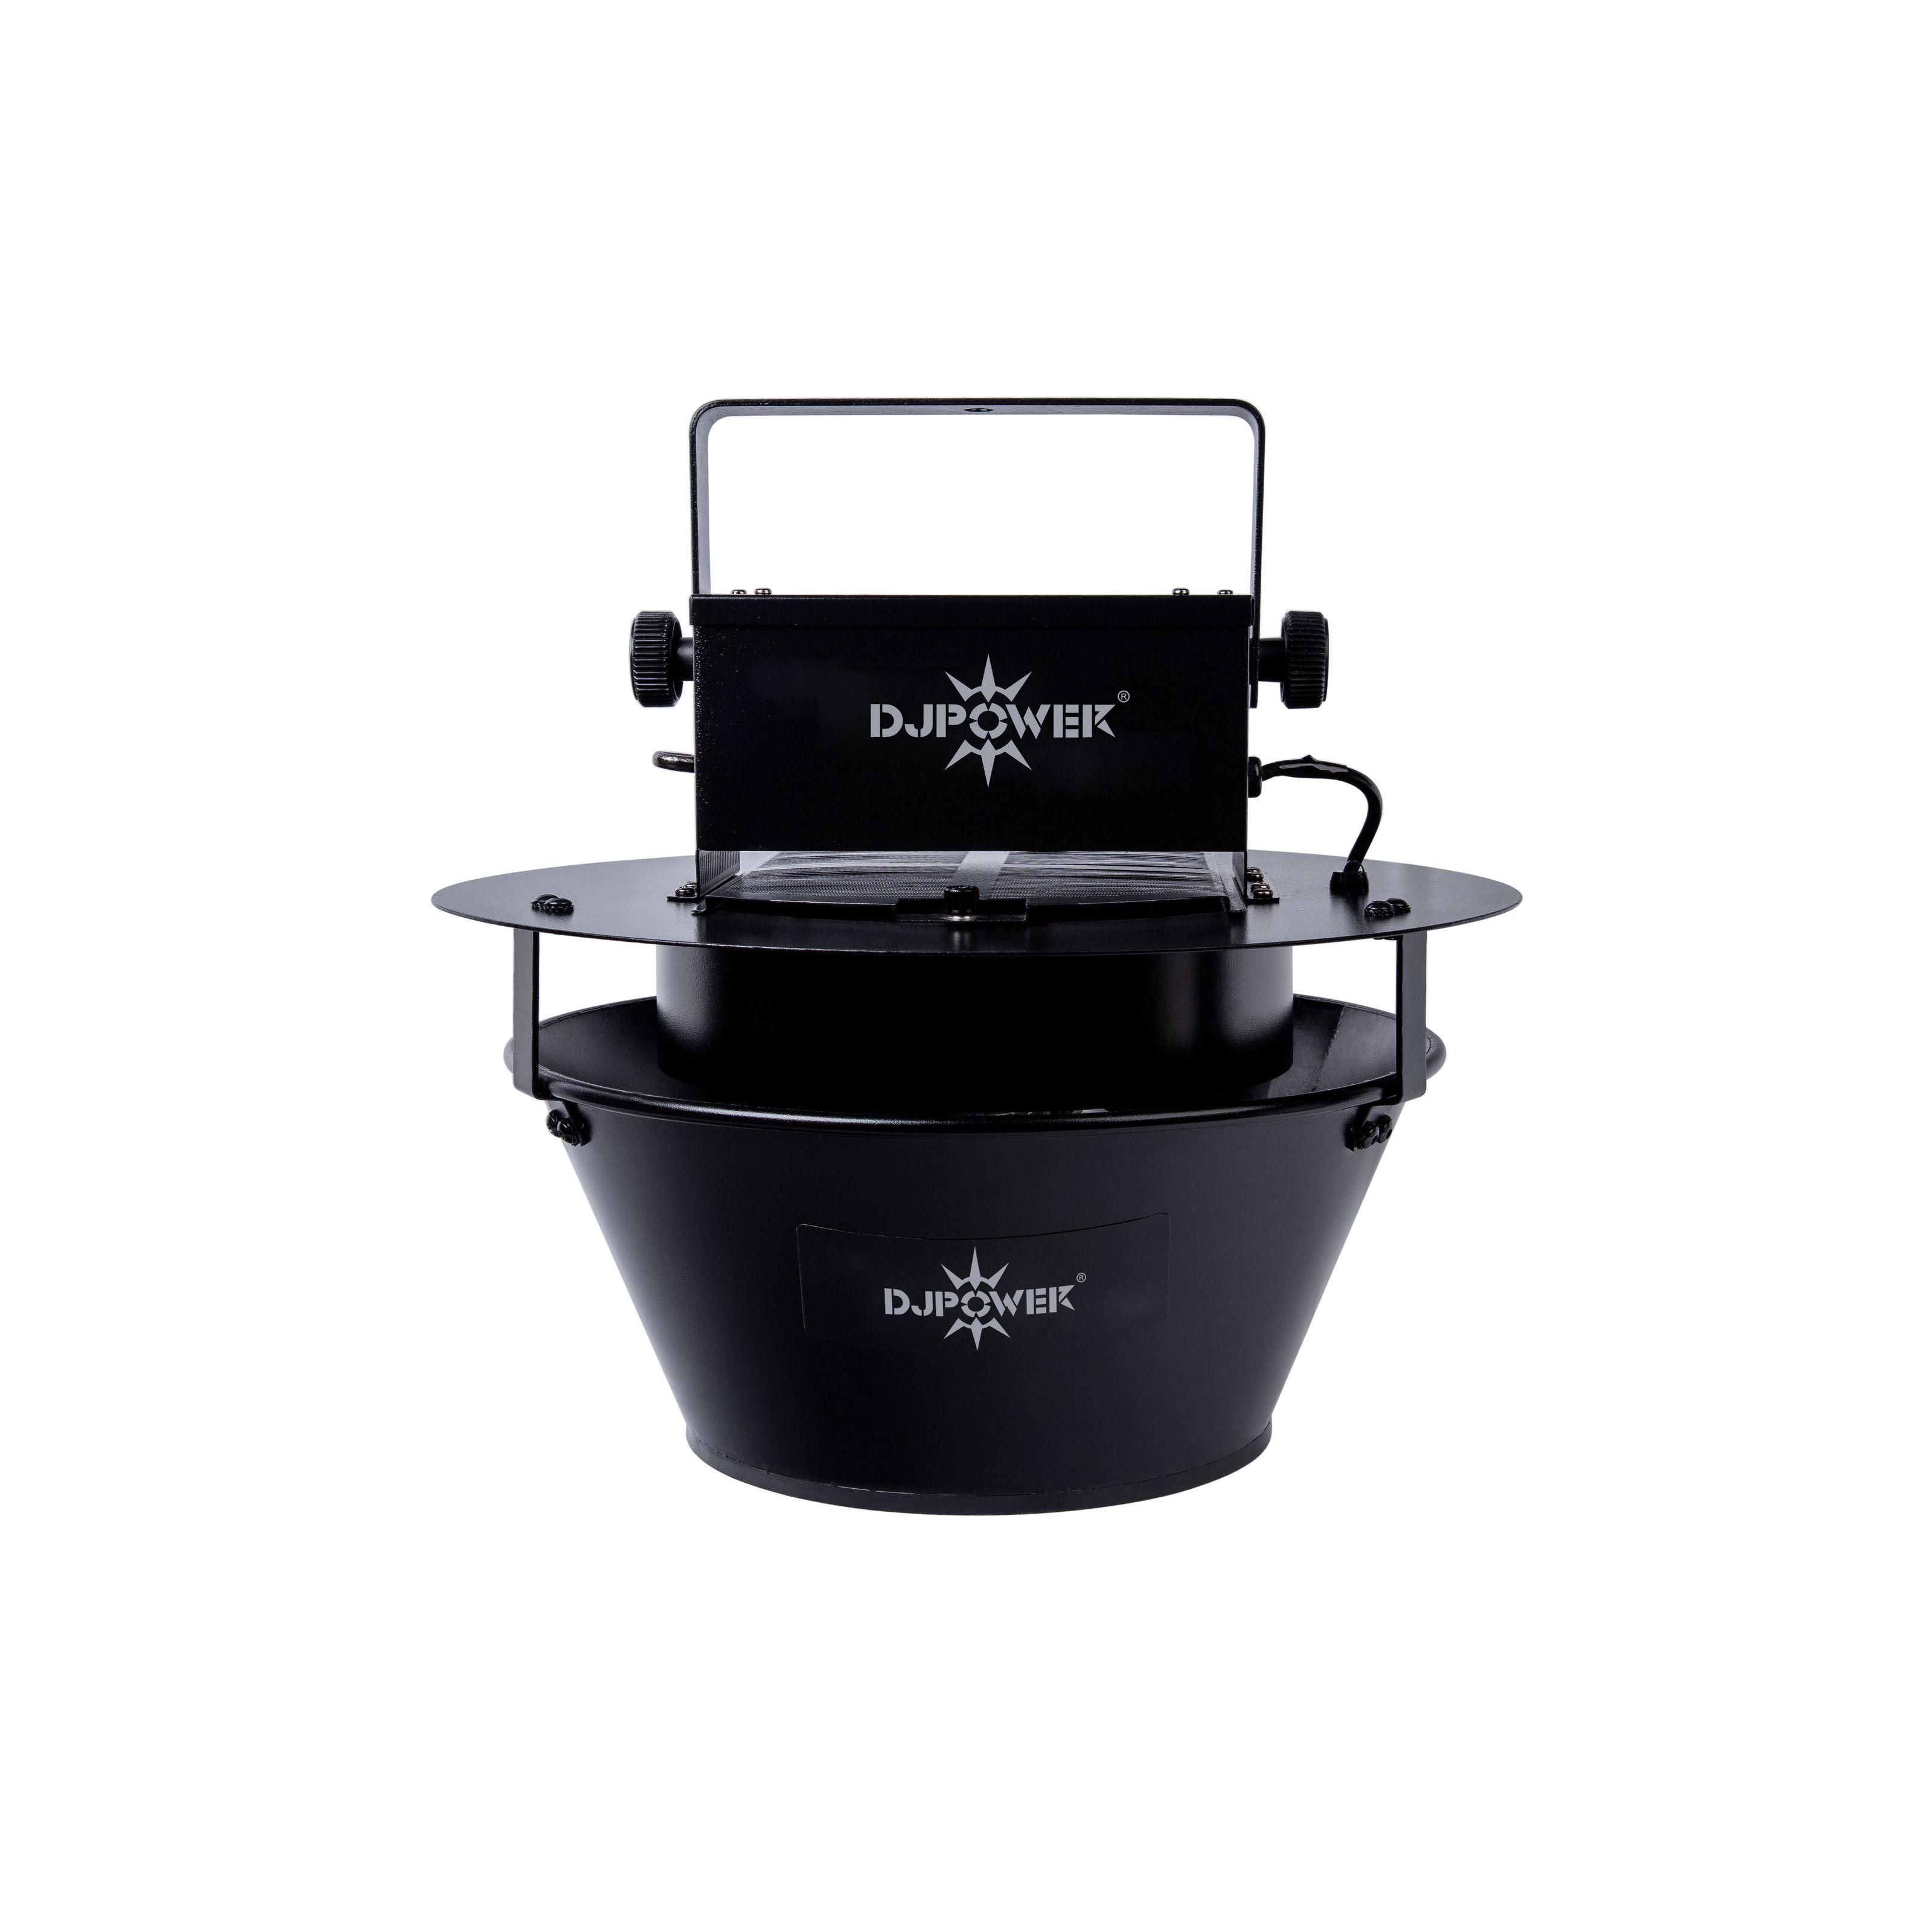 DJ Power - Confetti machine R-2